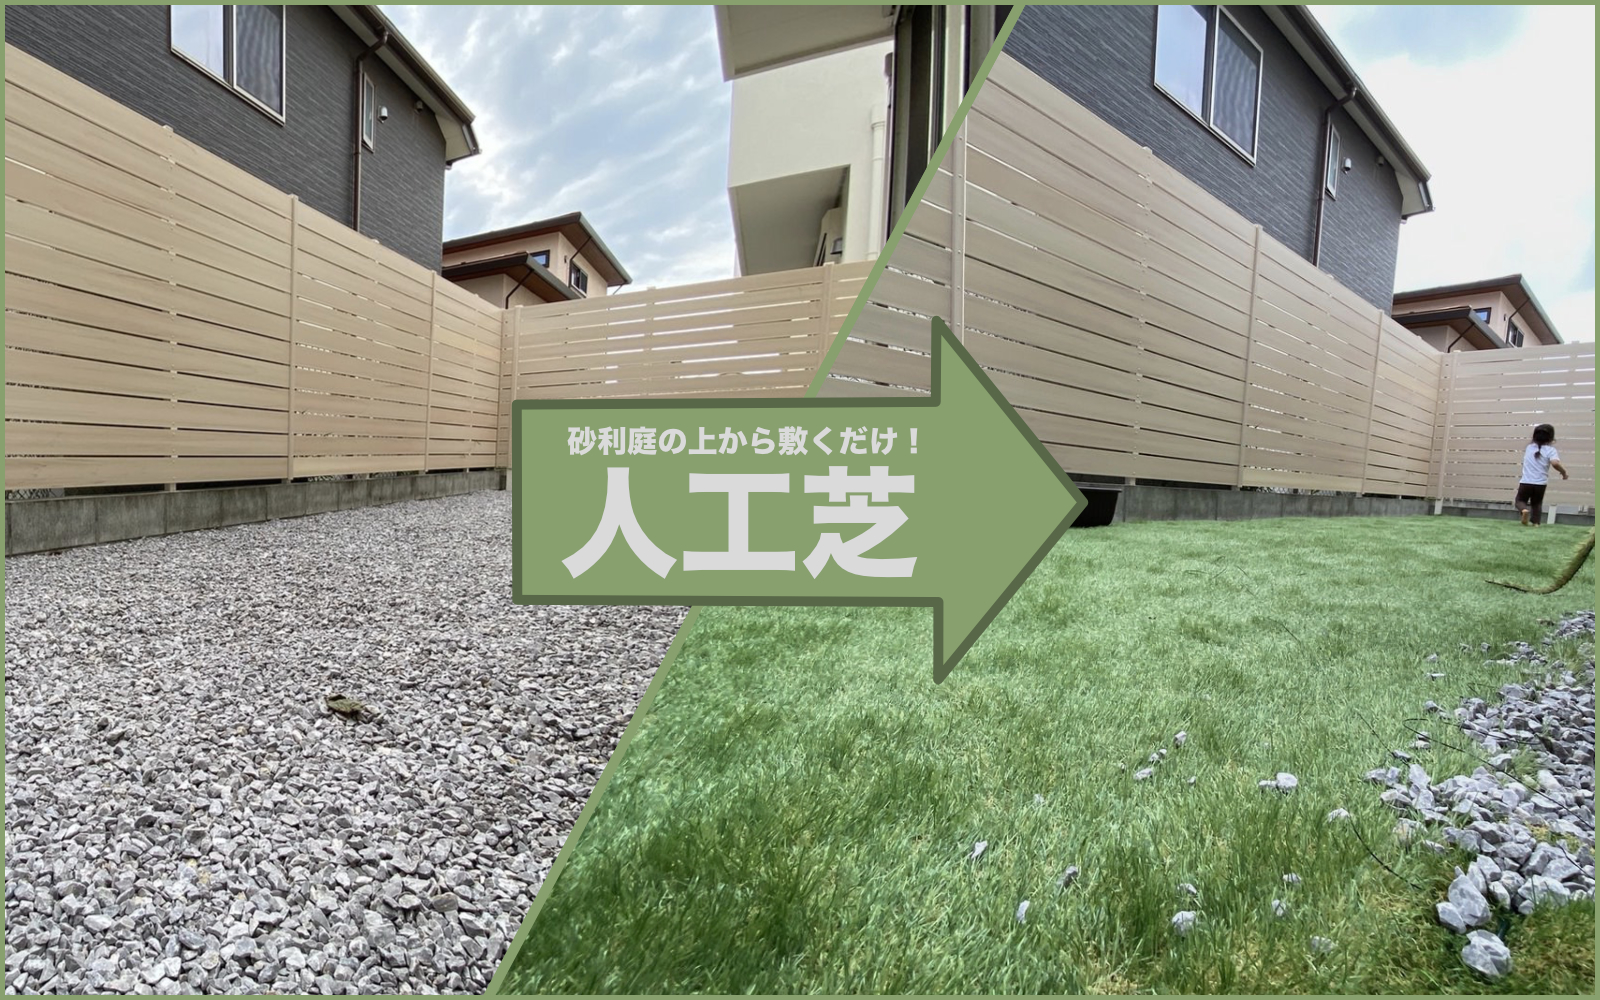 Artificial-lawn-in-backyard-review.jpg